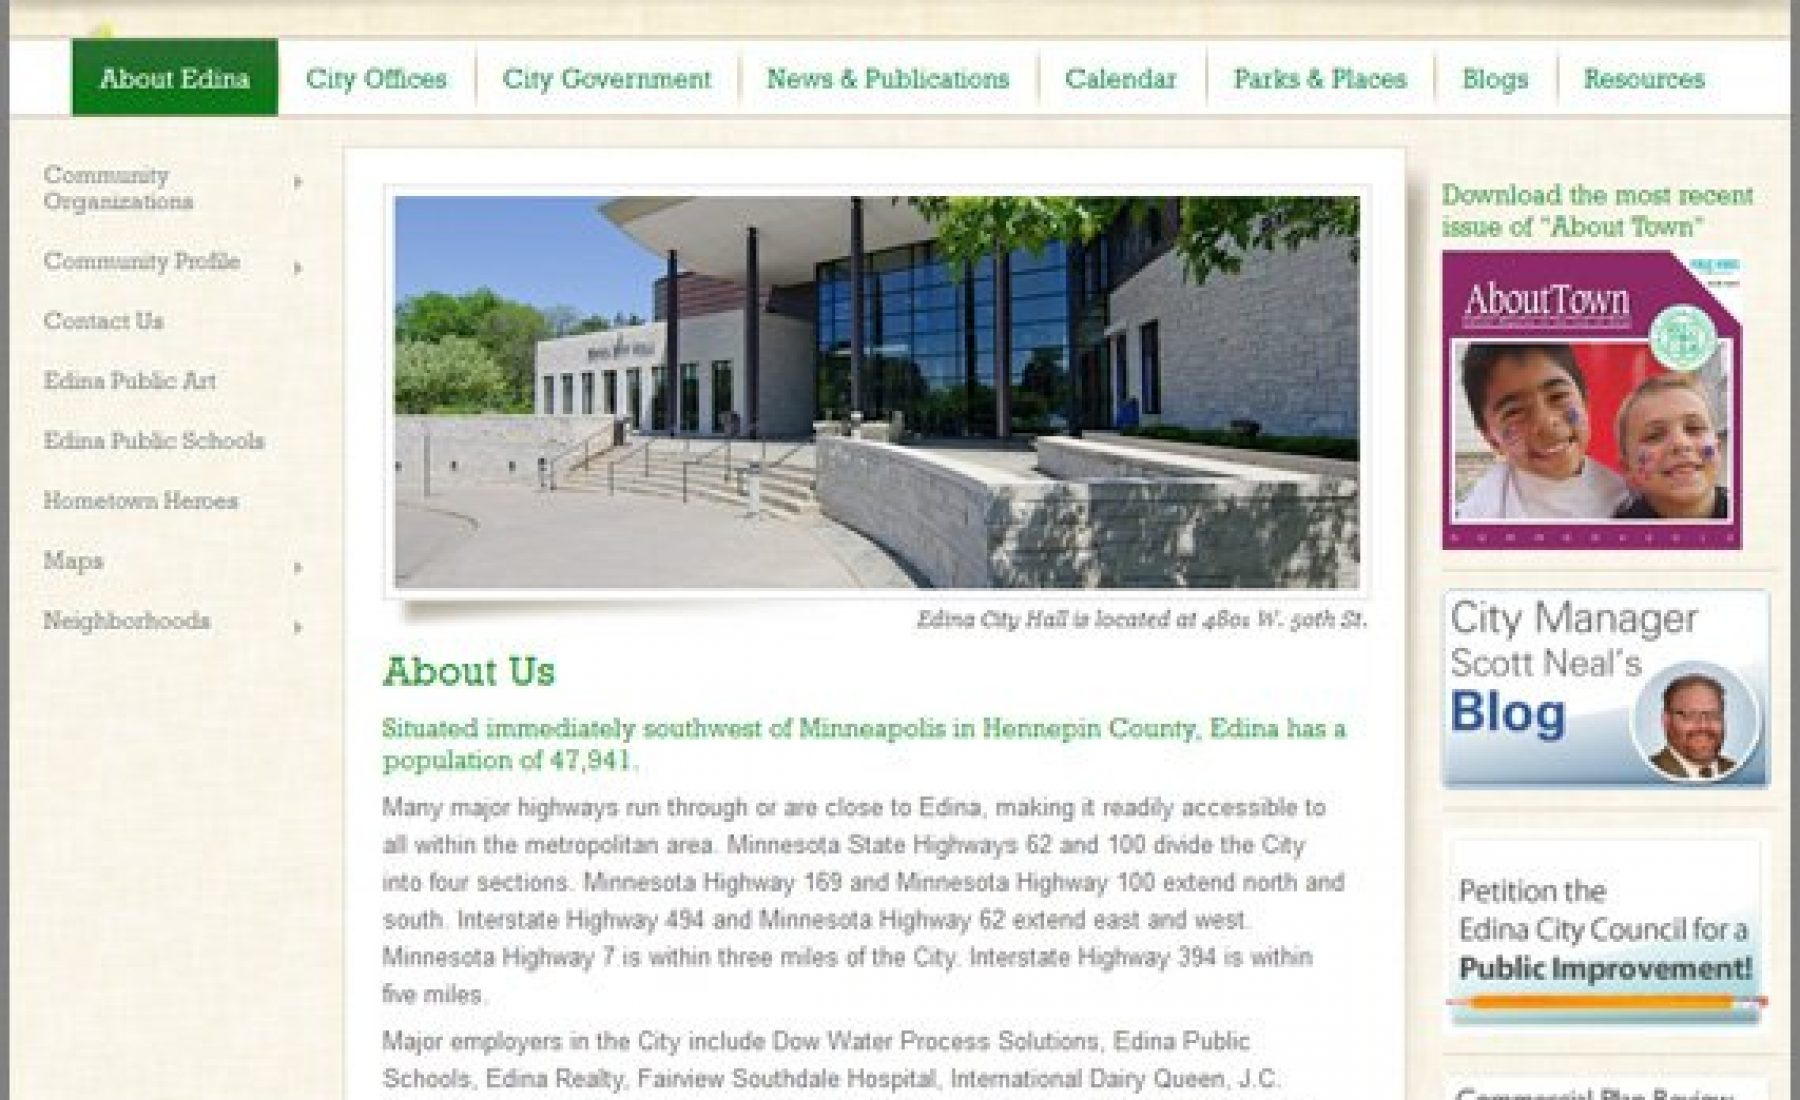 Photo on City of Edina Web Site